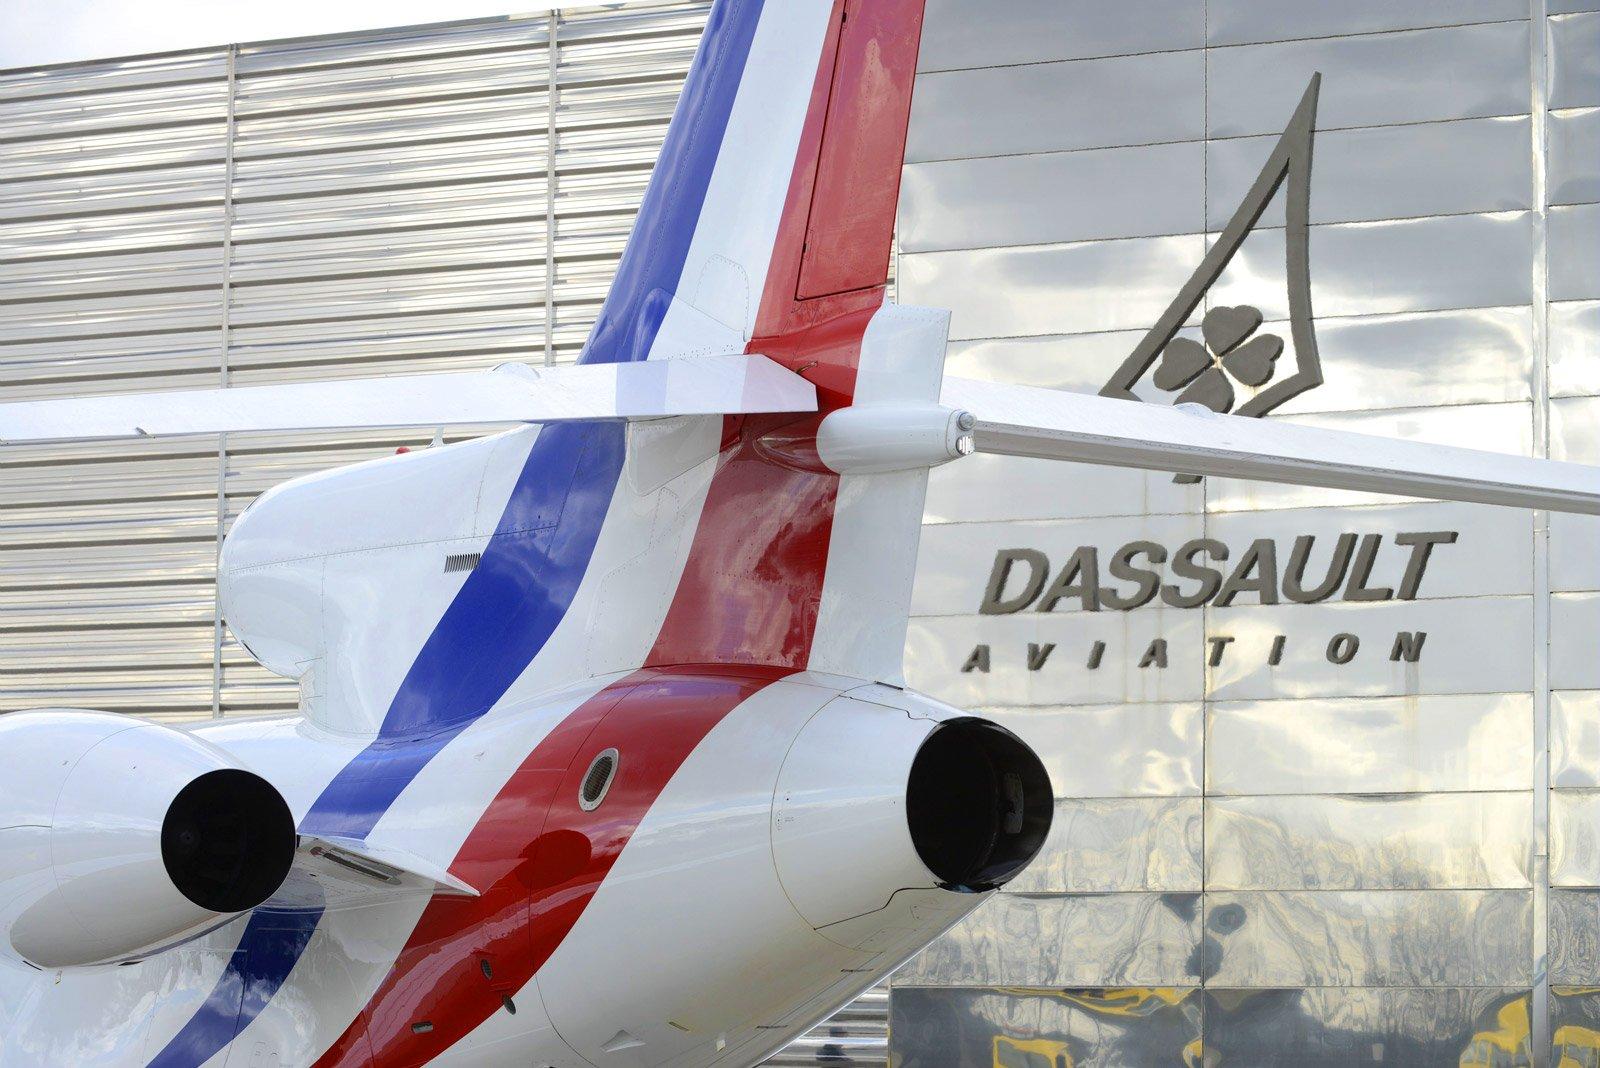 Our Company Profile - Dassault Aviation